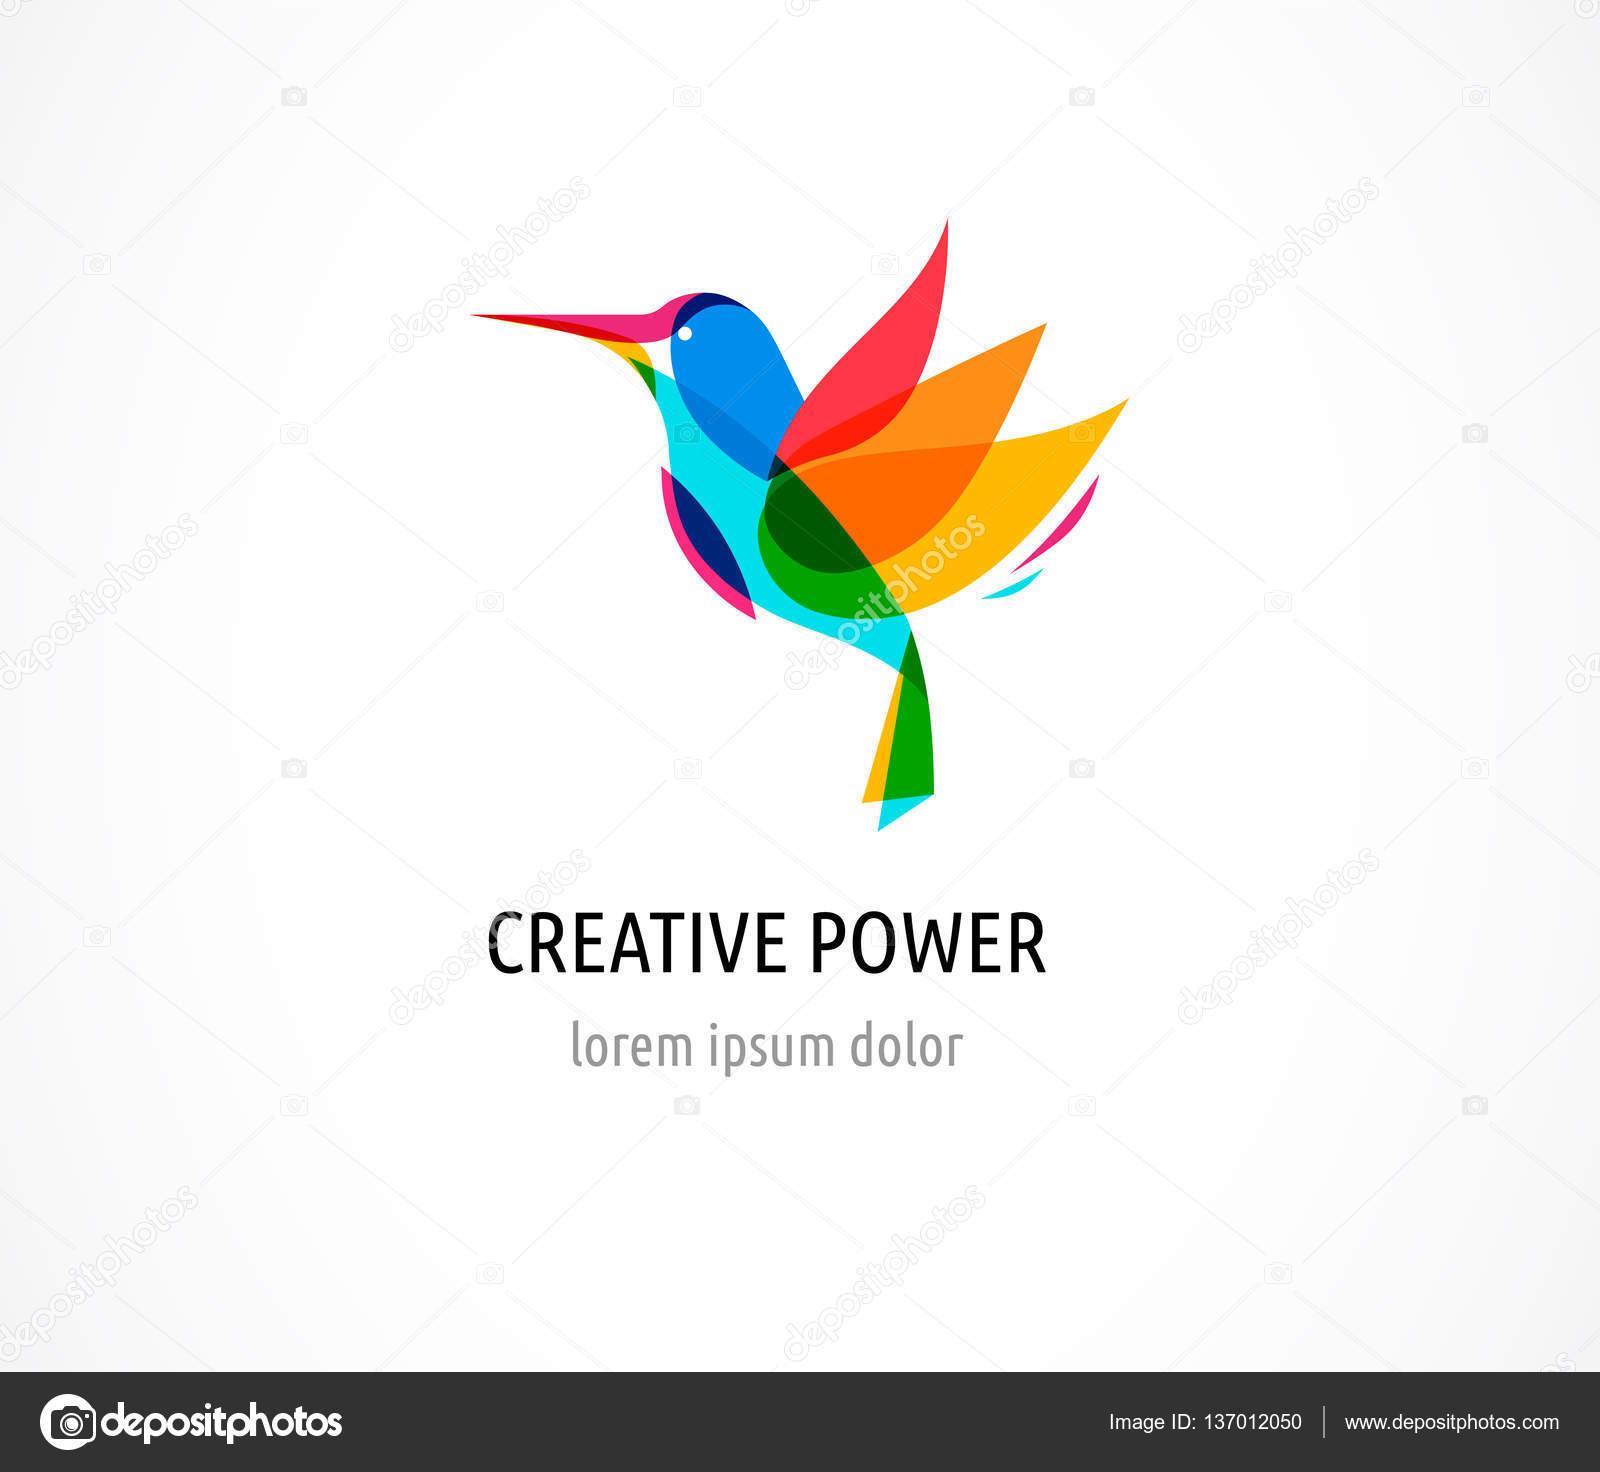 Hummingbird creative digital abstract and bird colorful icon hummingbird creative digital abstract and bird colorful icon stock vector biocorpaavc Images